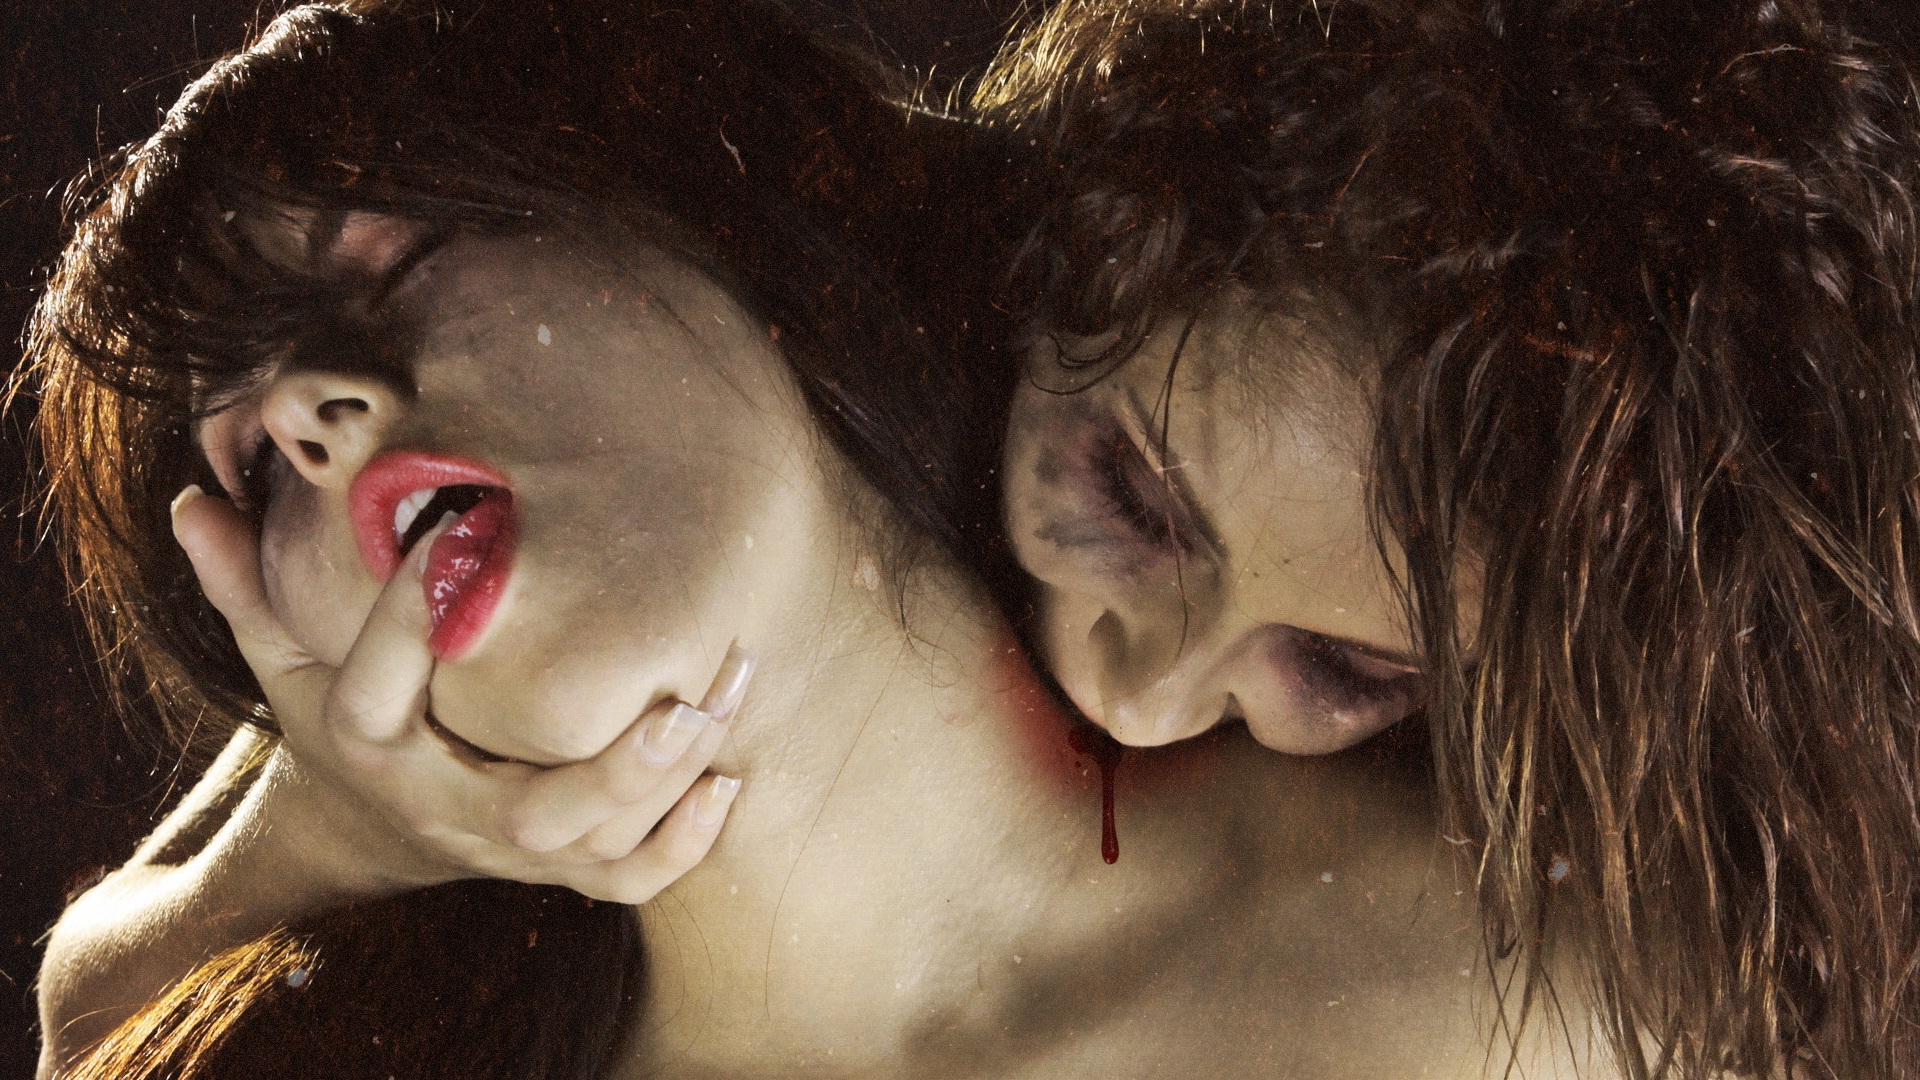 Lesbian blood porno videos